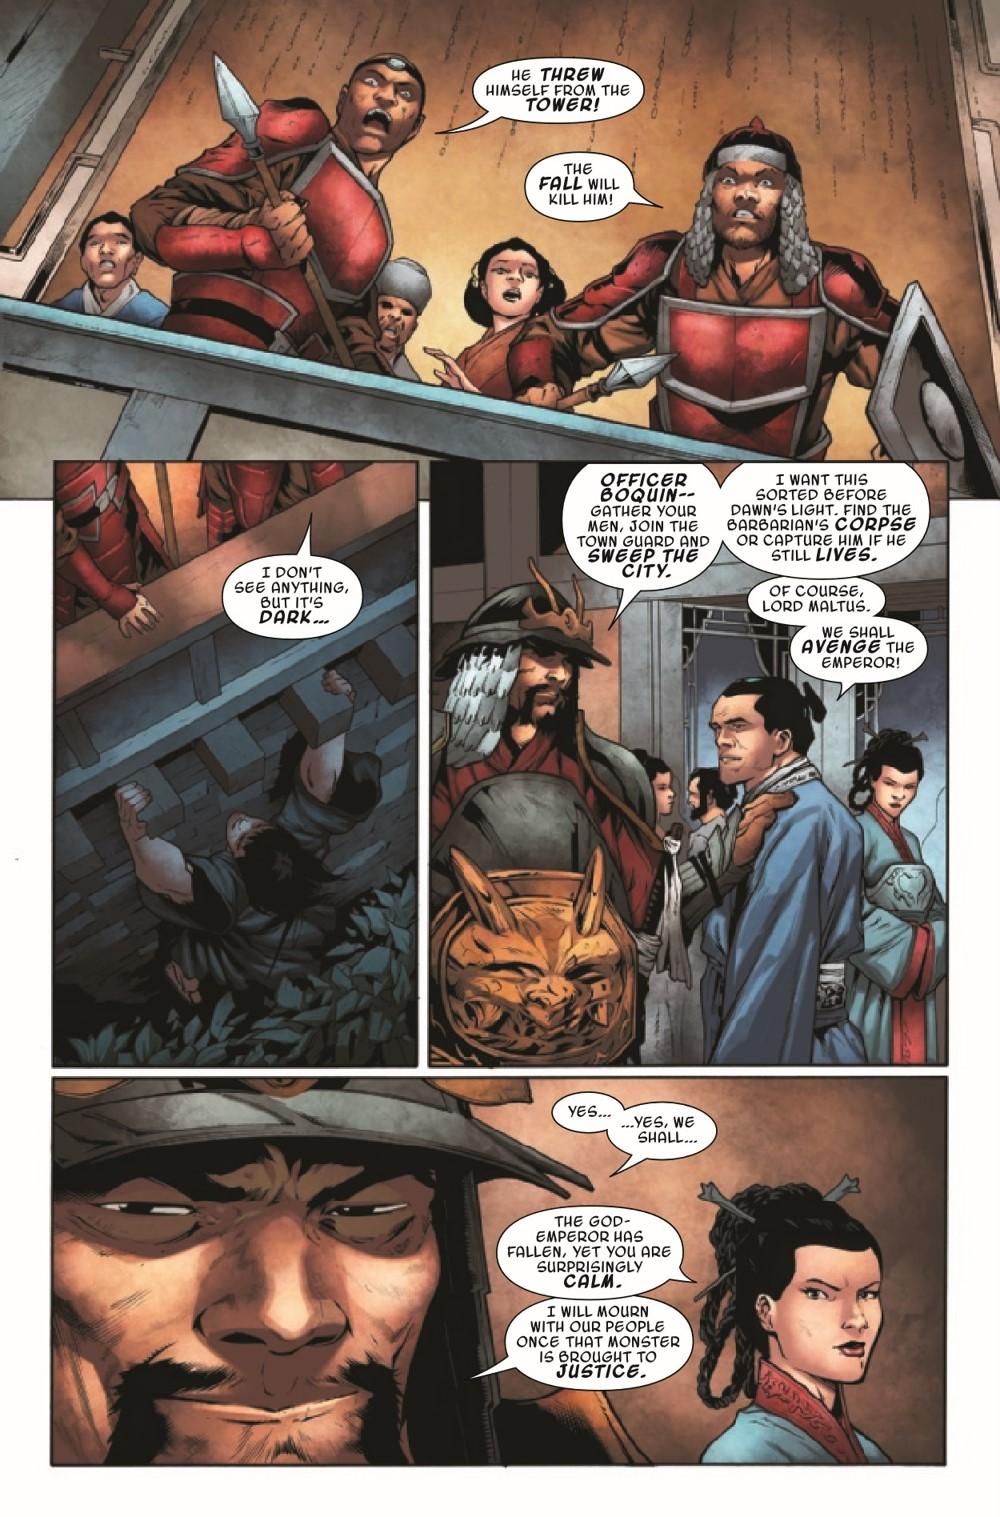 CONANBARB2019023_Preview-6 ComicList Previews: CONAN THE BARBARIAN #23